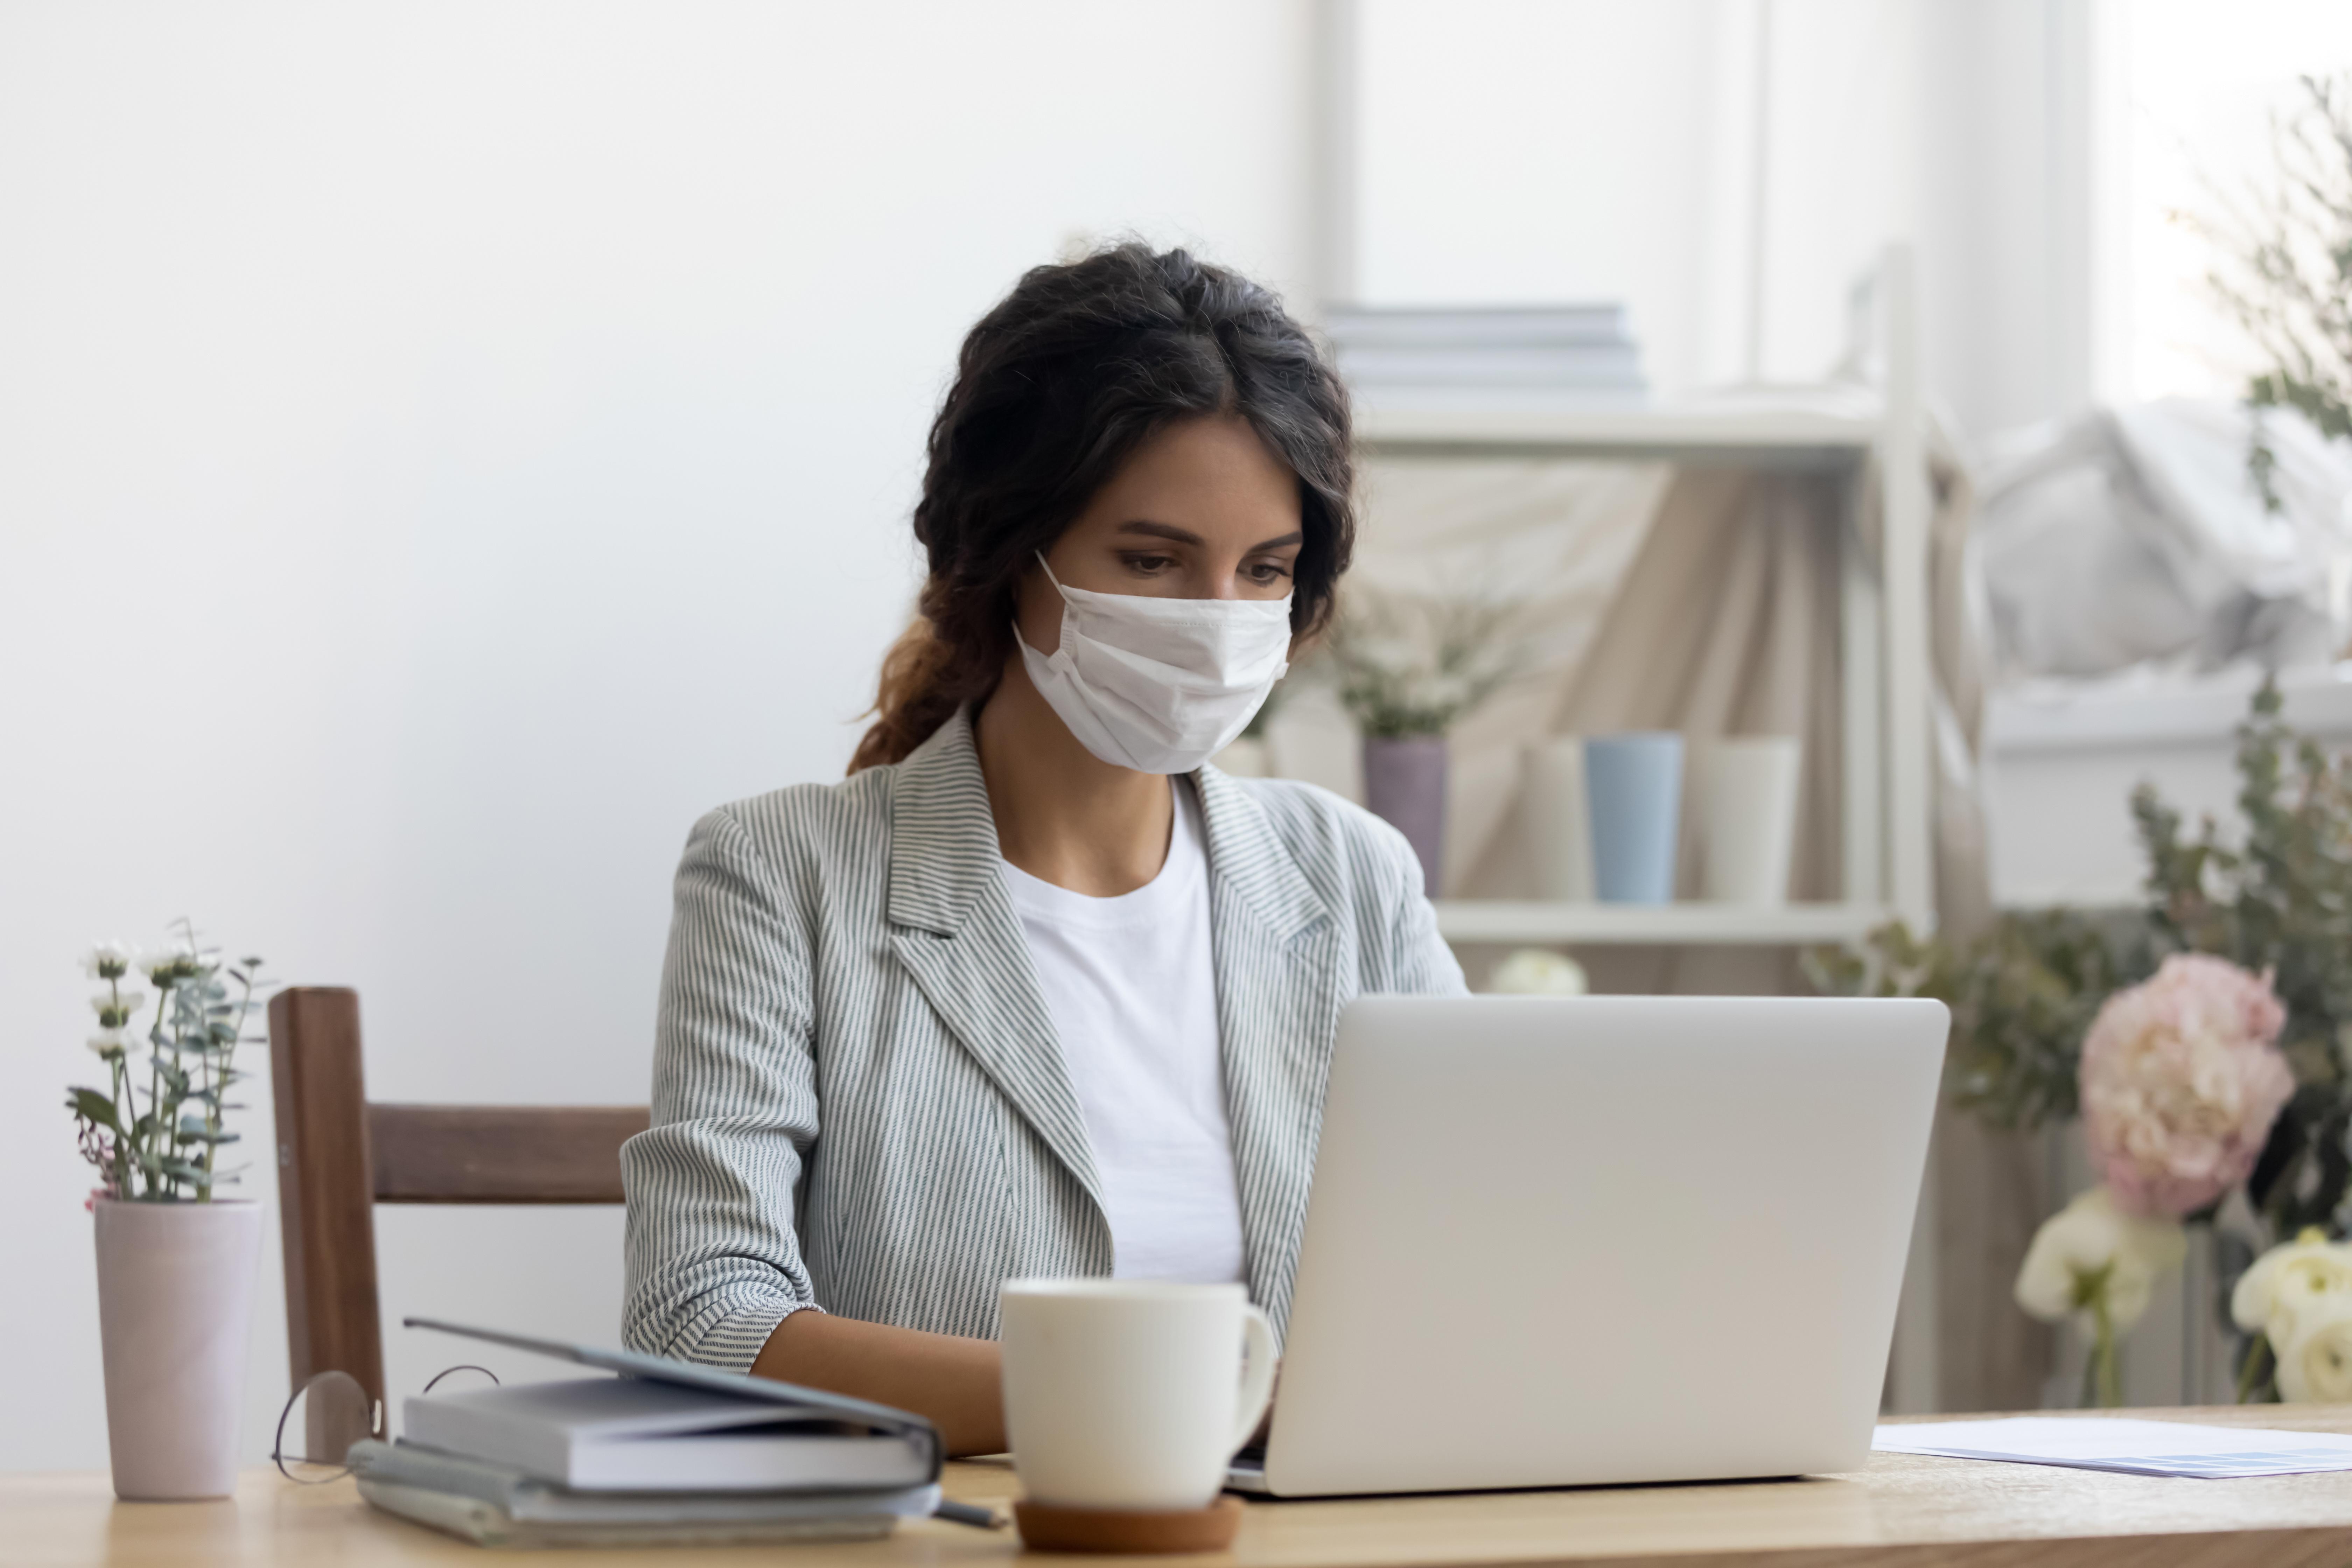 Frau arbeitet mit Maske im Büro